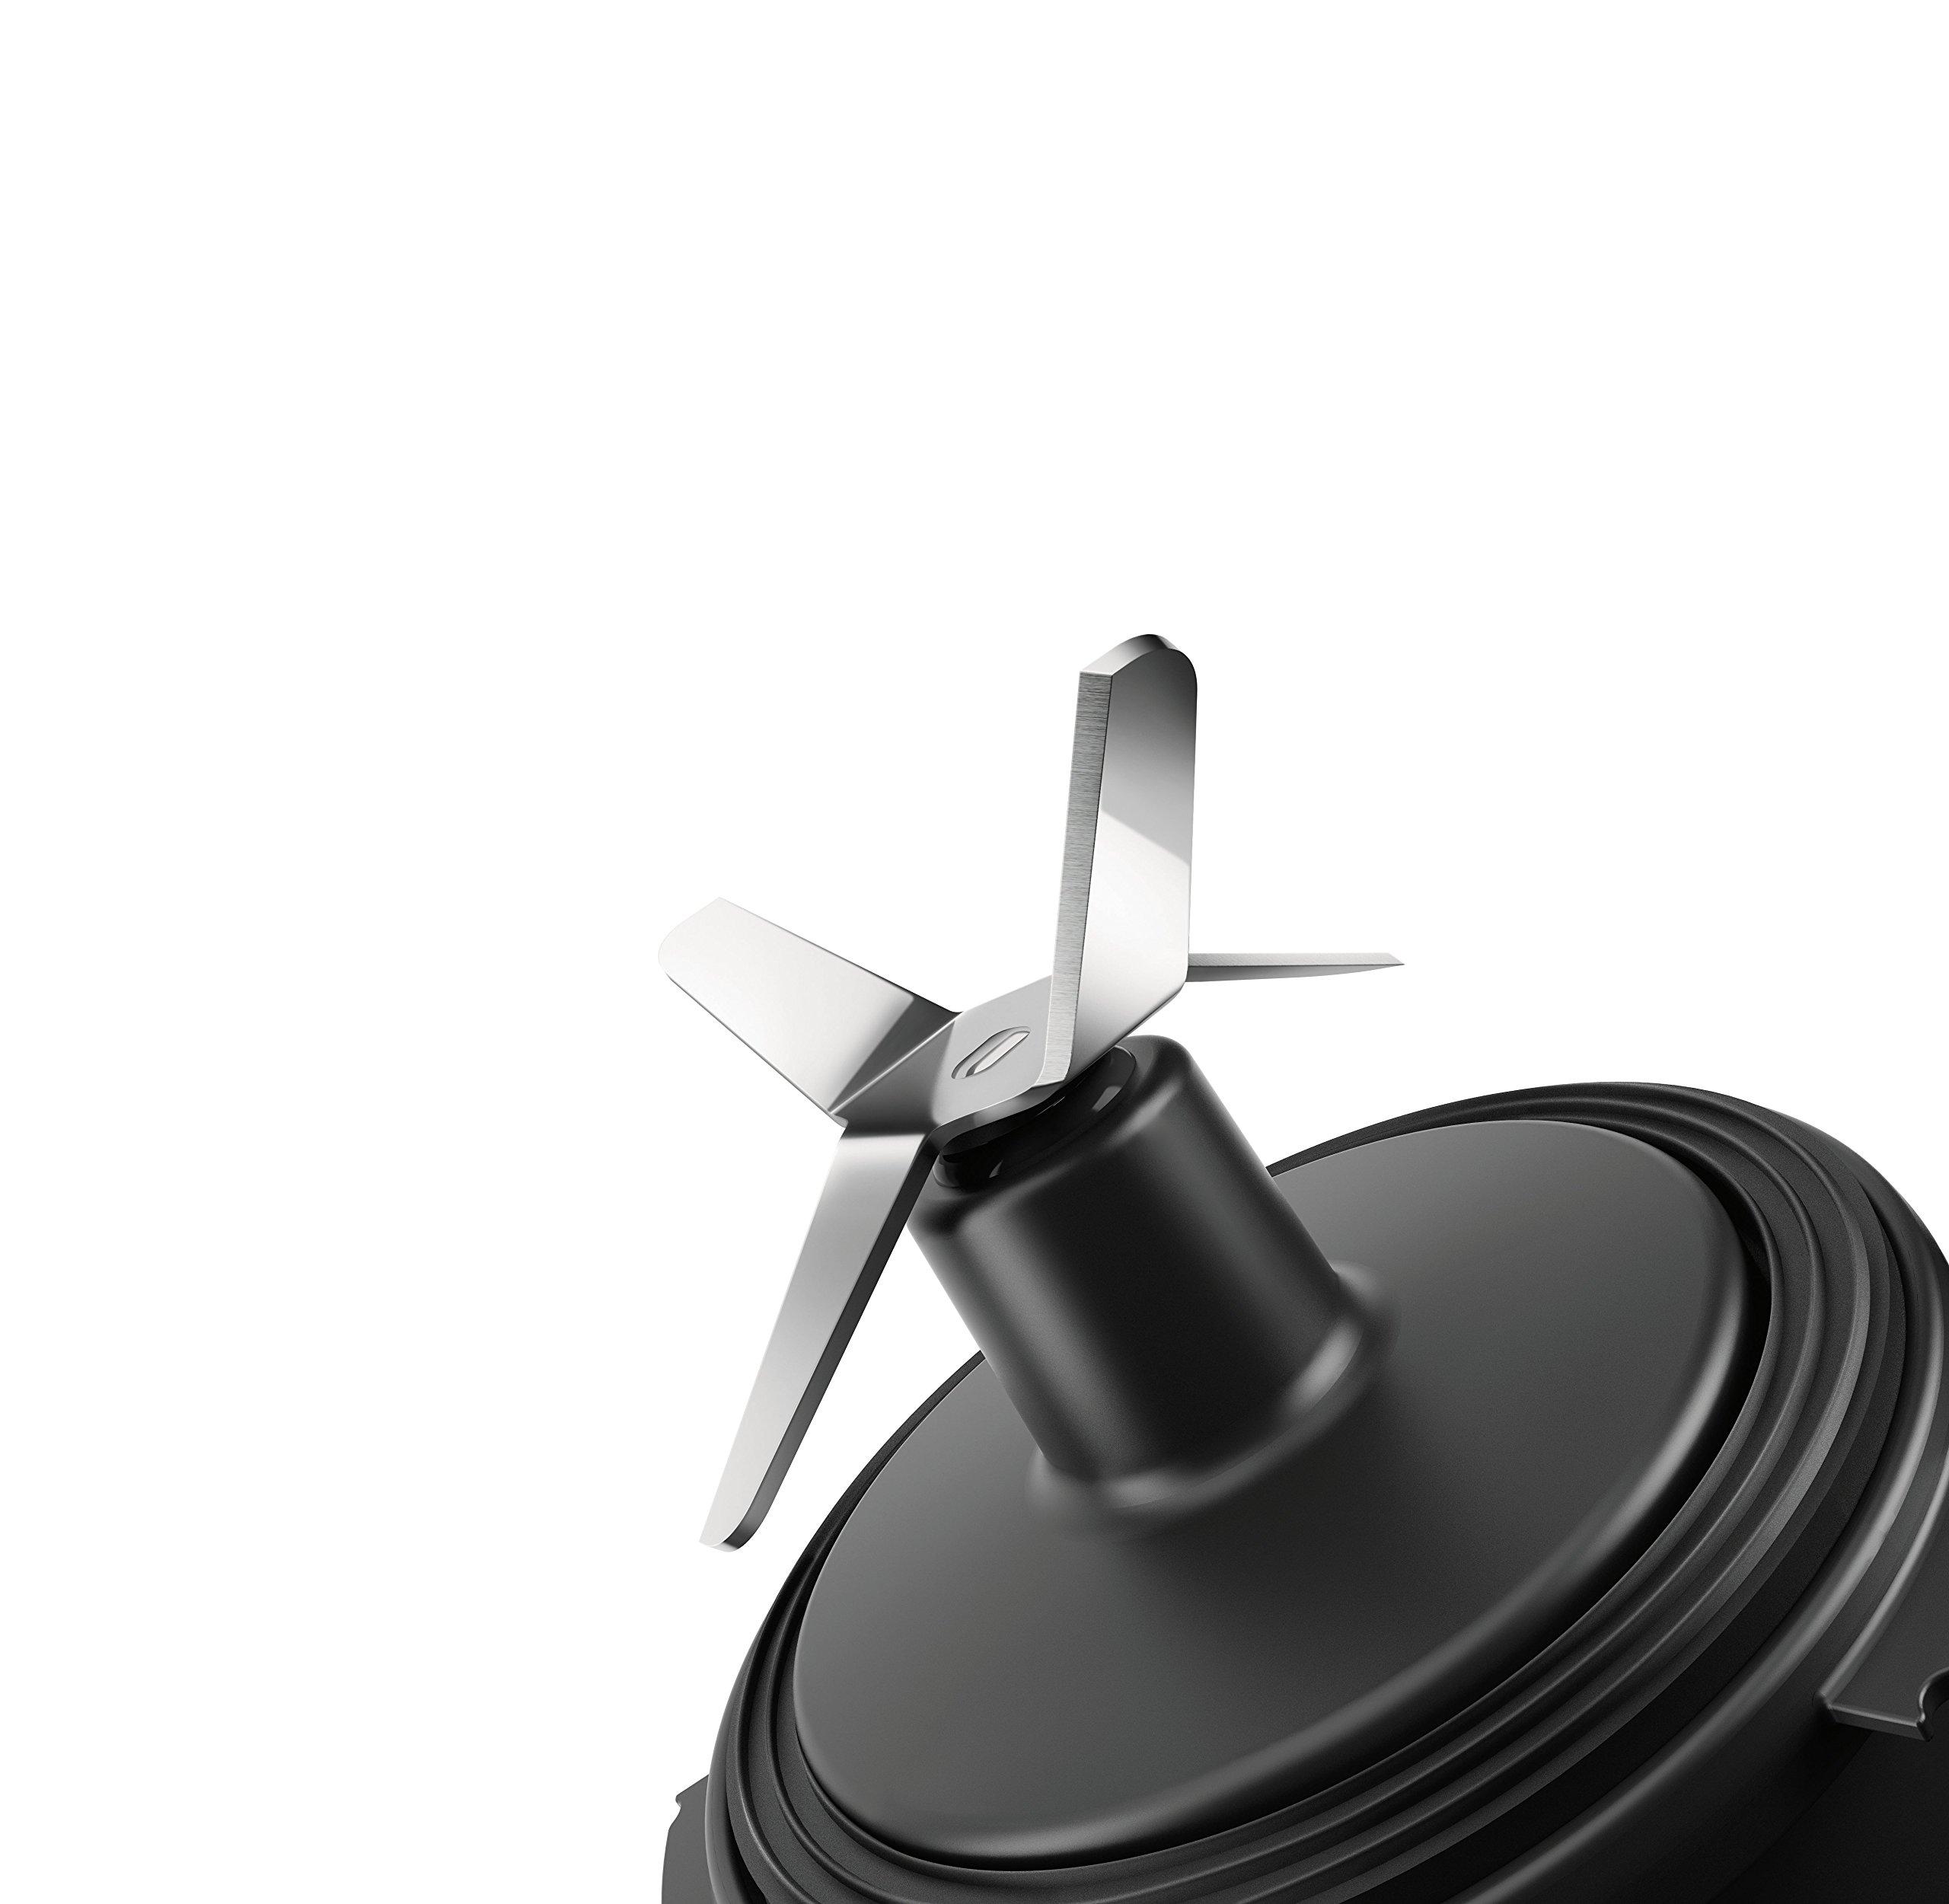 Philips HR2877/08 - Licuadora (0,6 L, Batidora de vaso, Negro ...